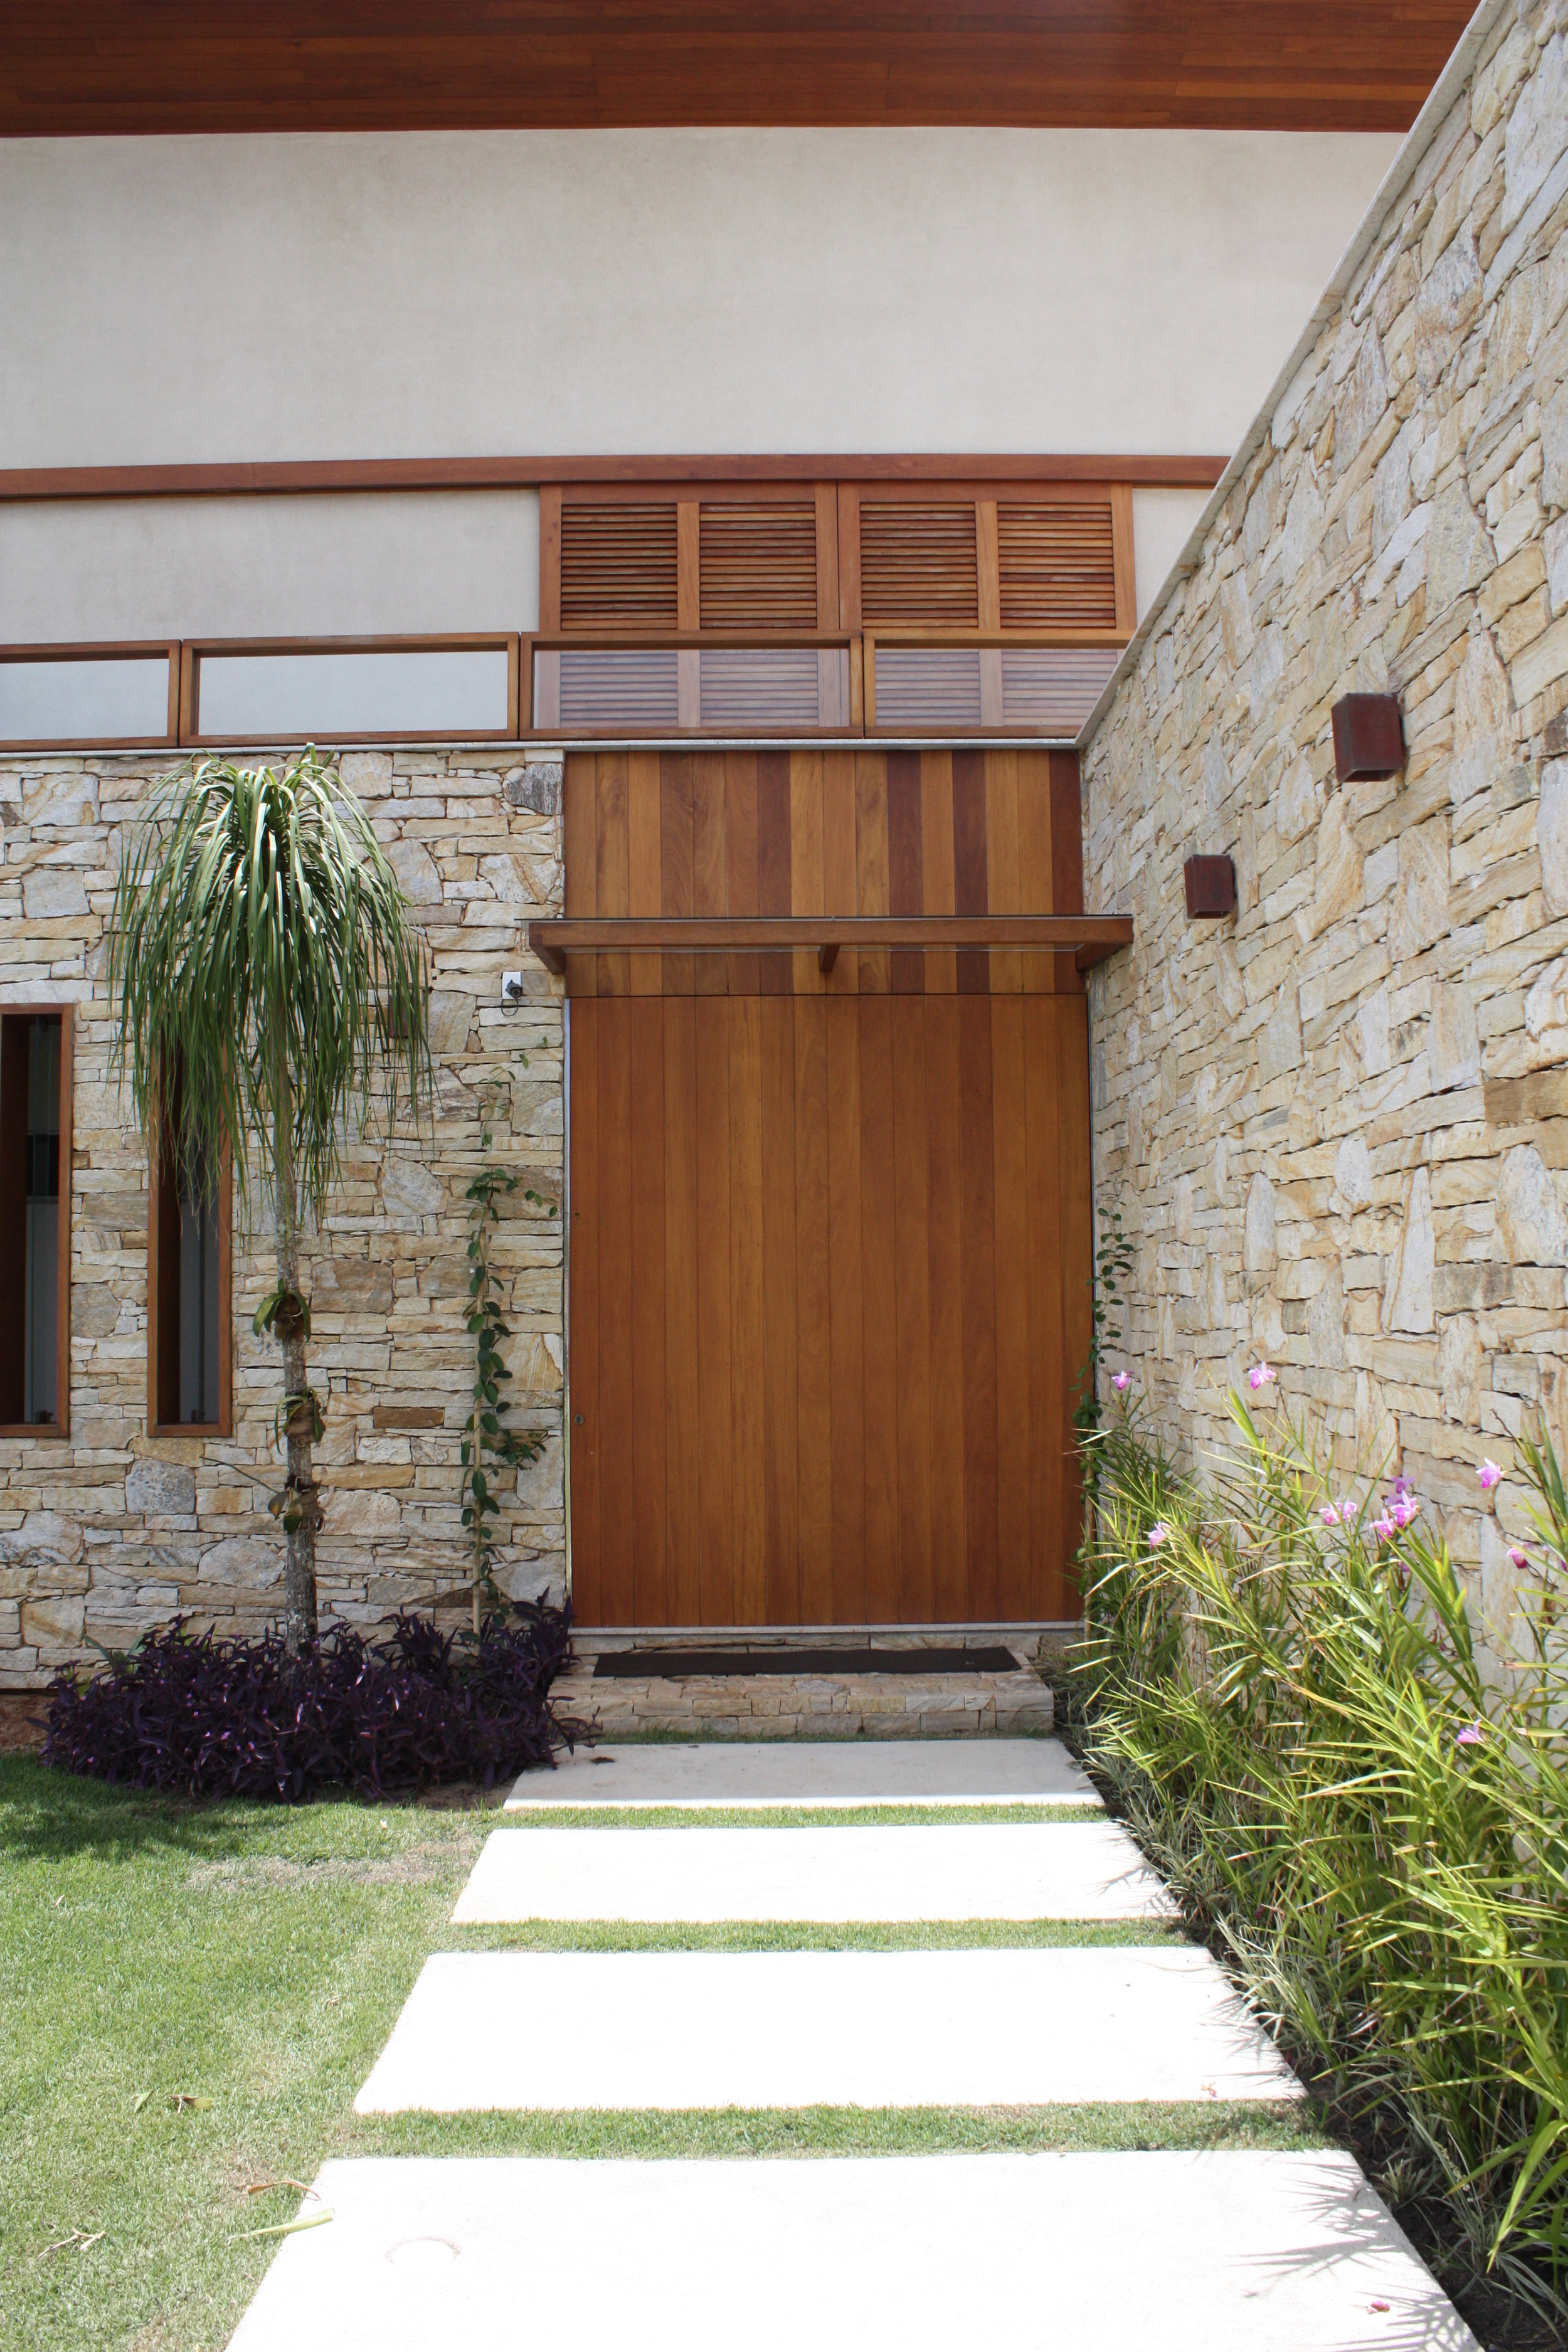 Casa em Búzios - RJ